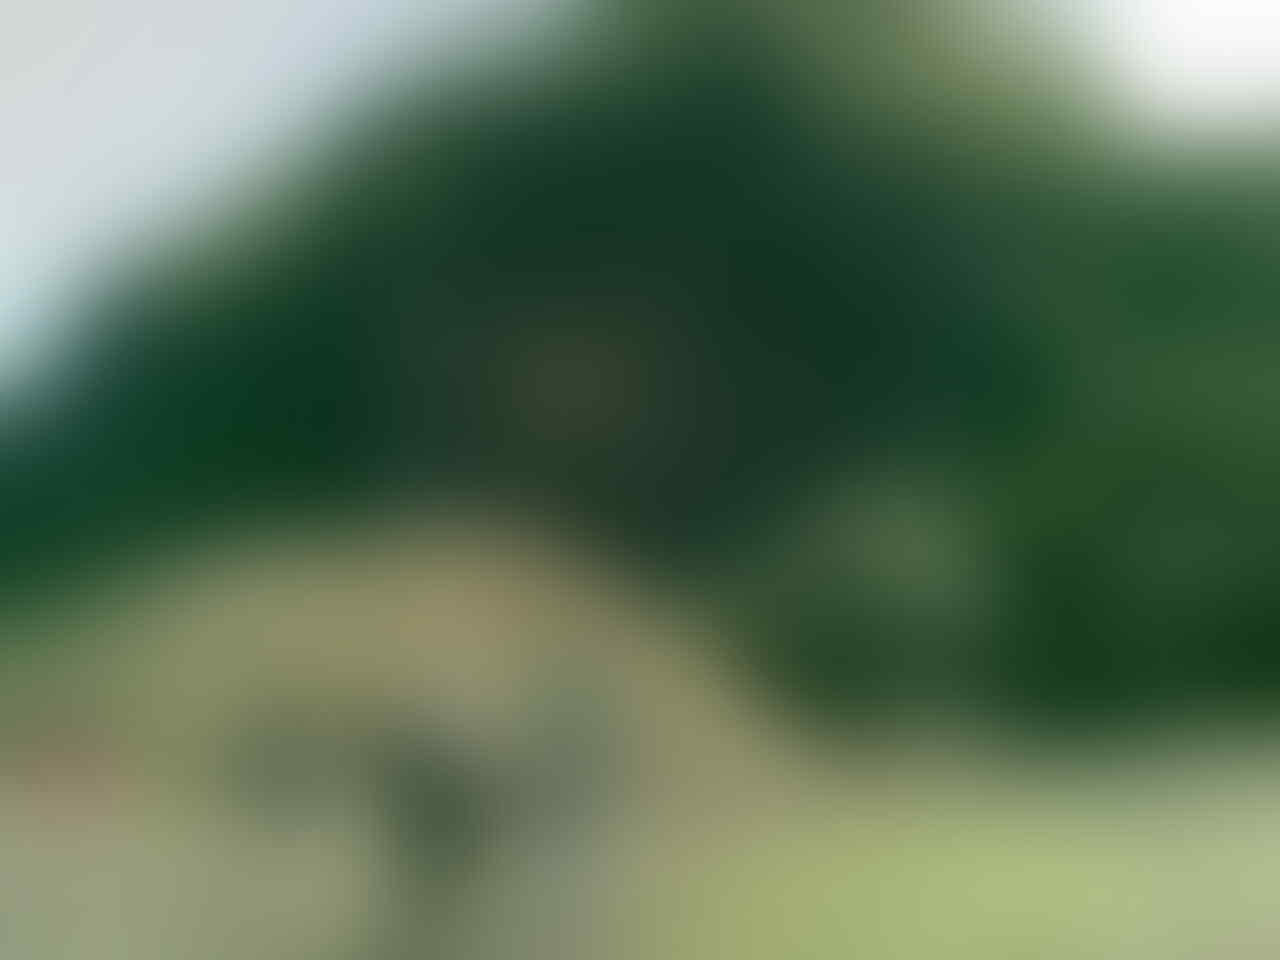 ۩۞ [FR] Berlibur, Bermain dan Berbagi - Kaskus Regional Cilacap ۩۞